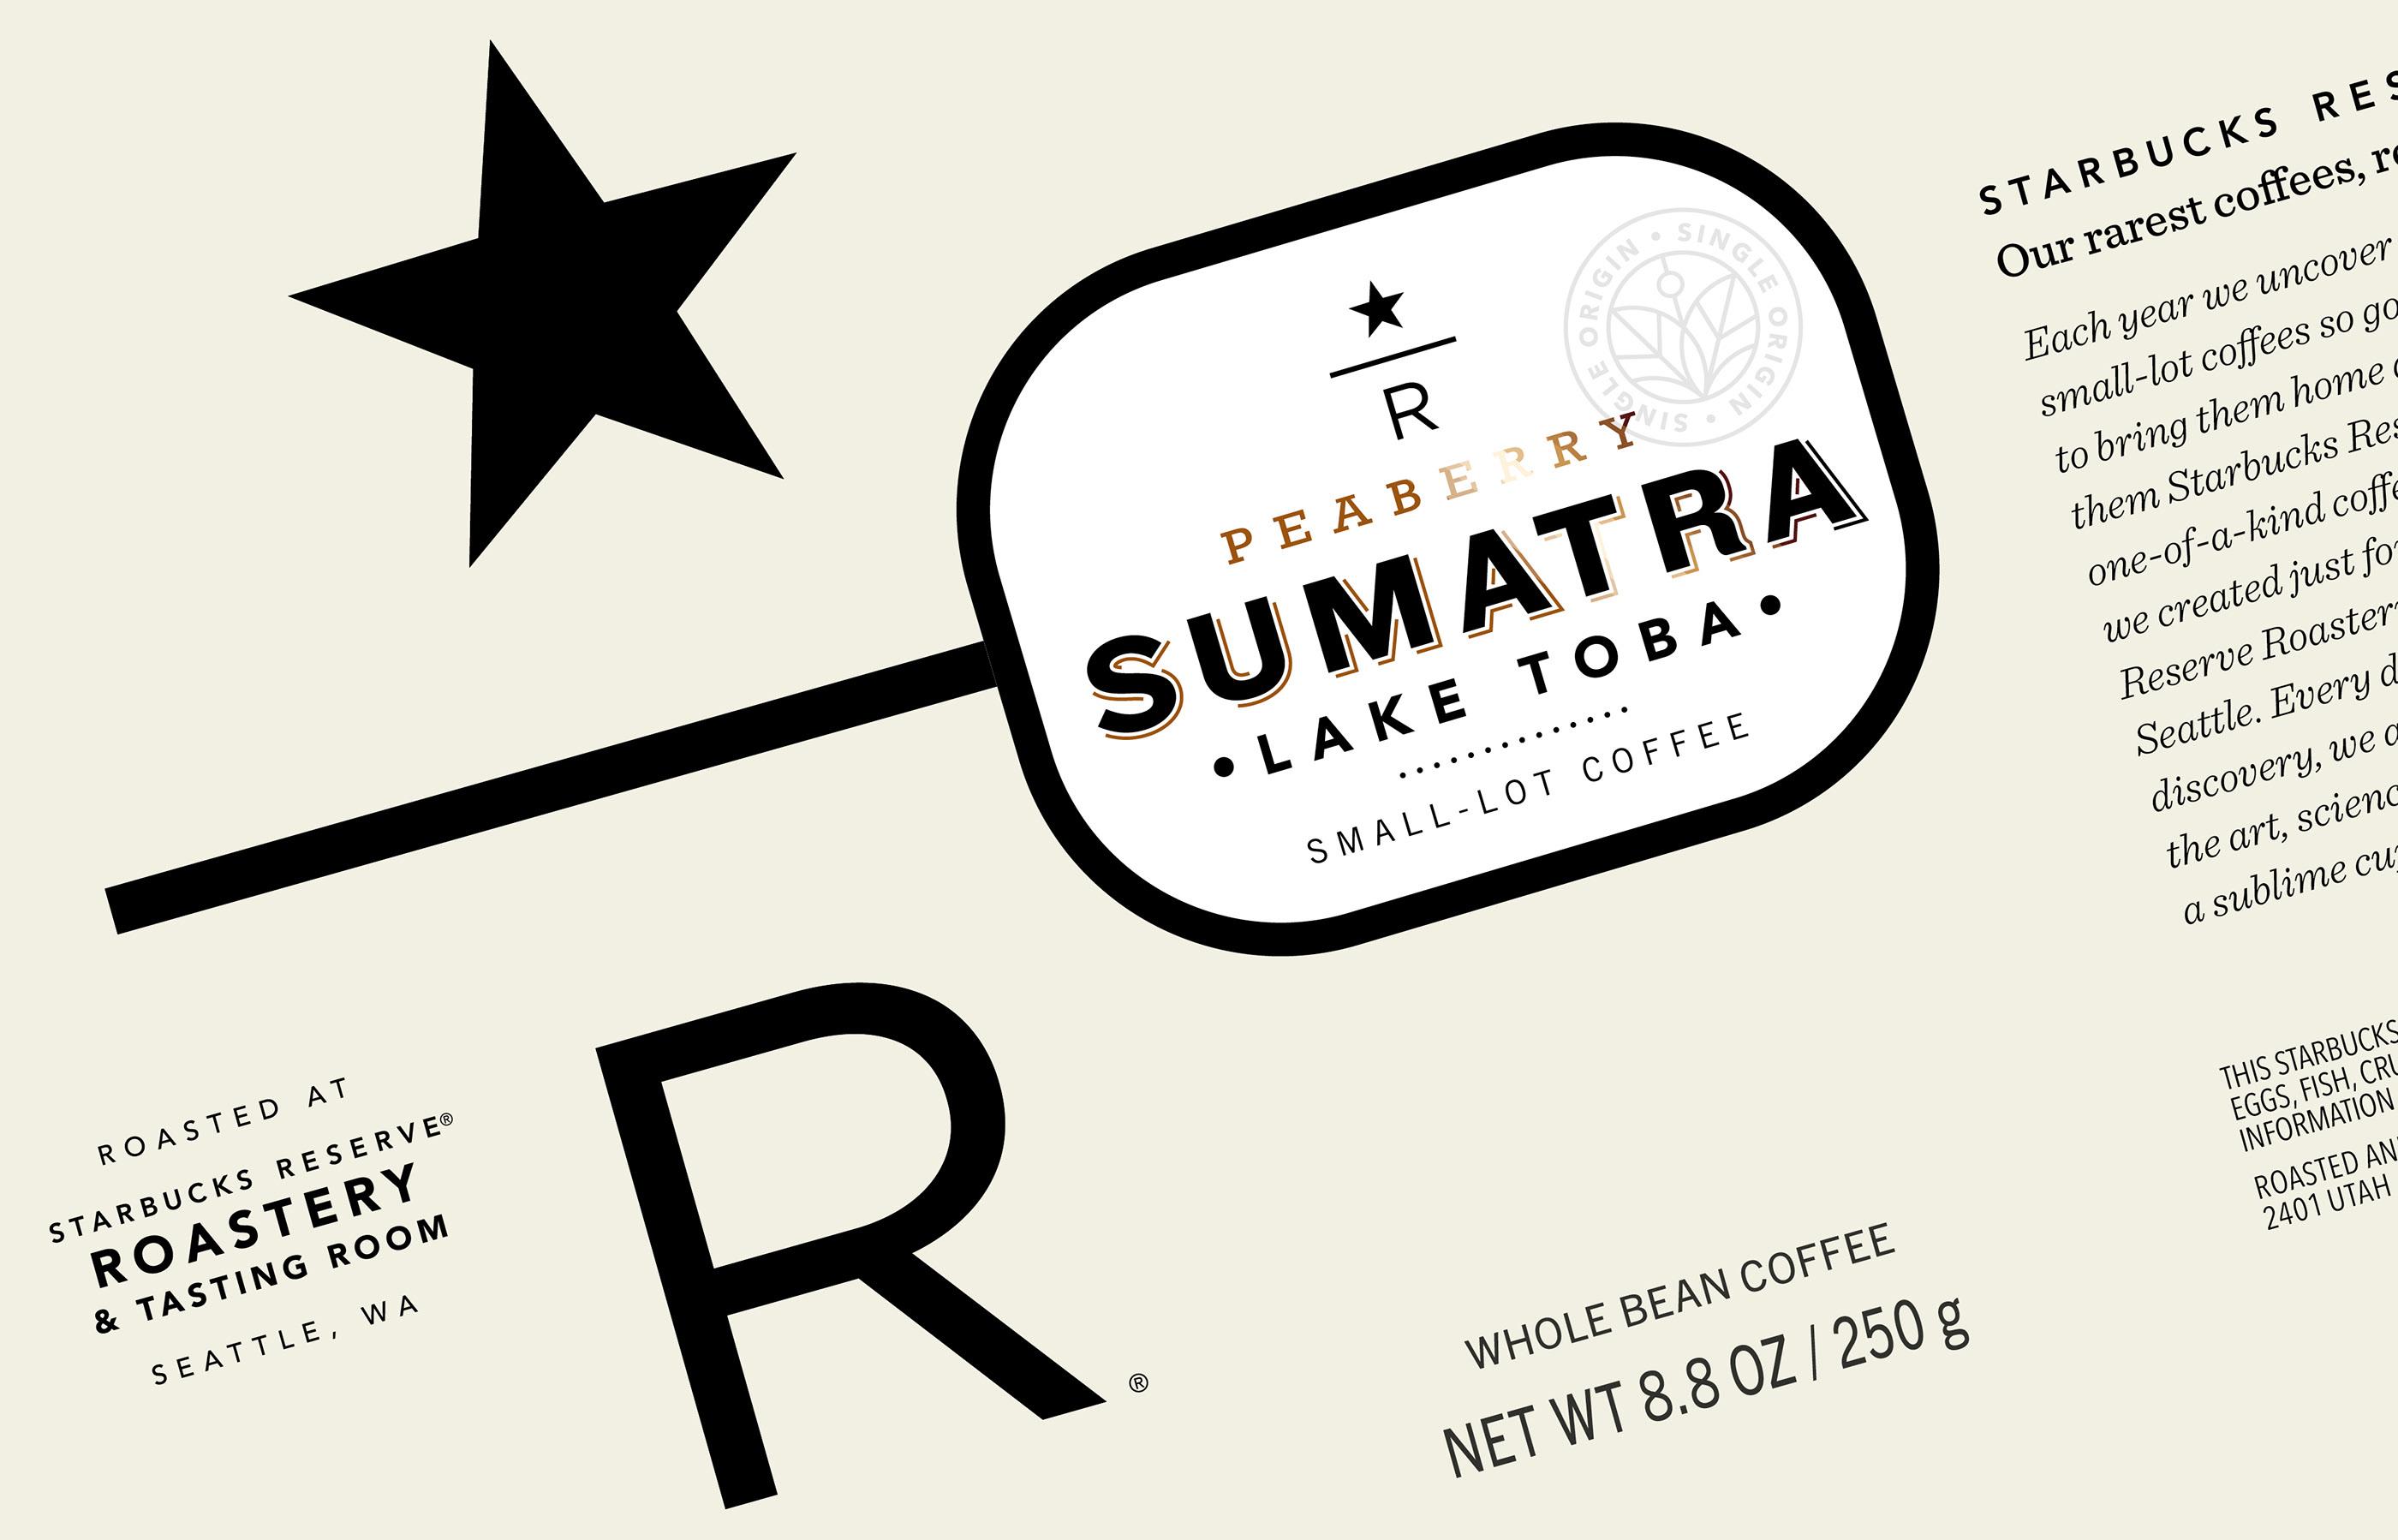 Starbucks Reserve Roastery Tasting Room On Behance